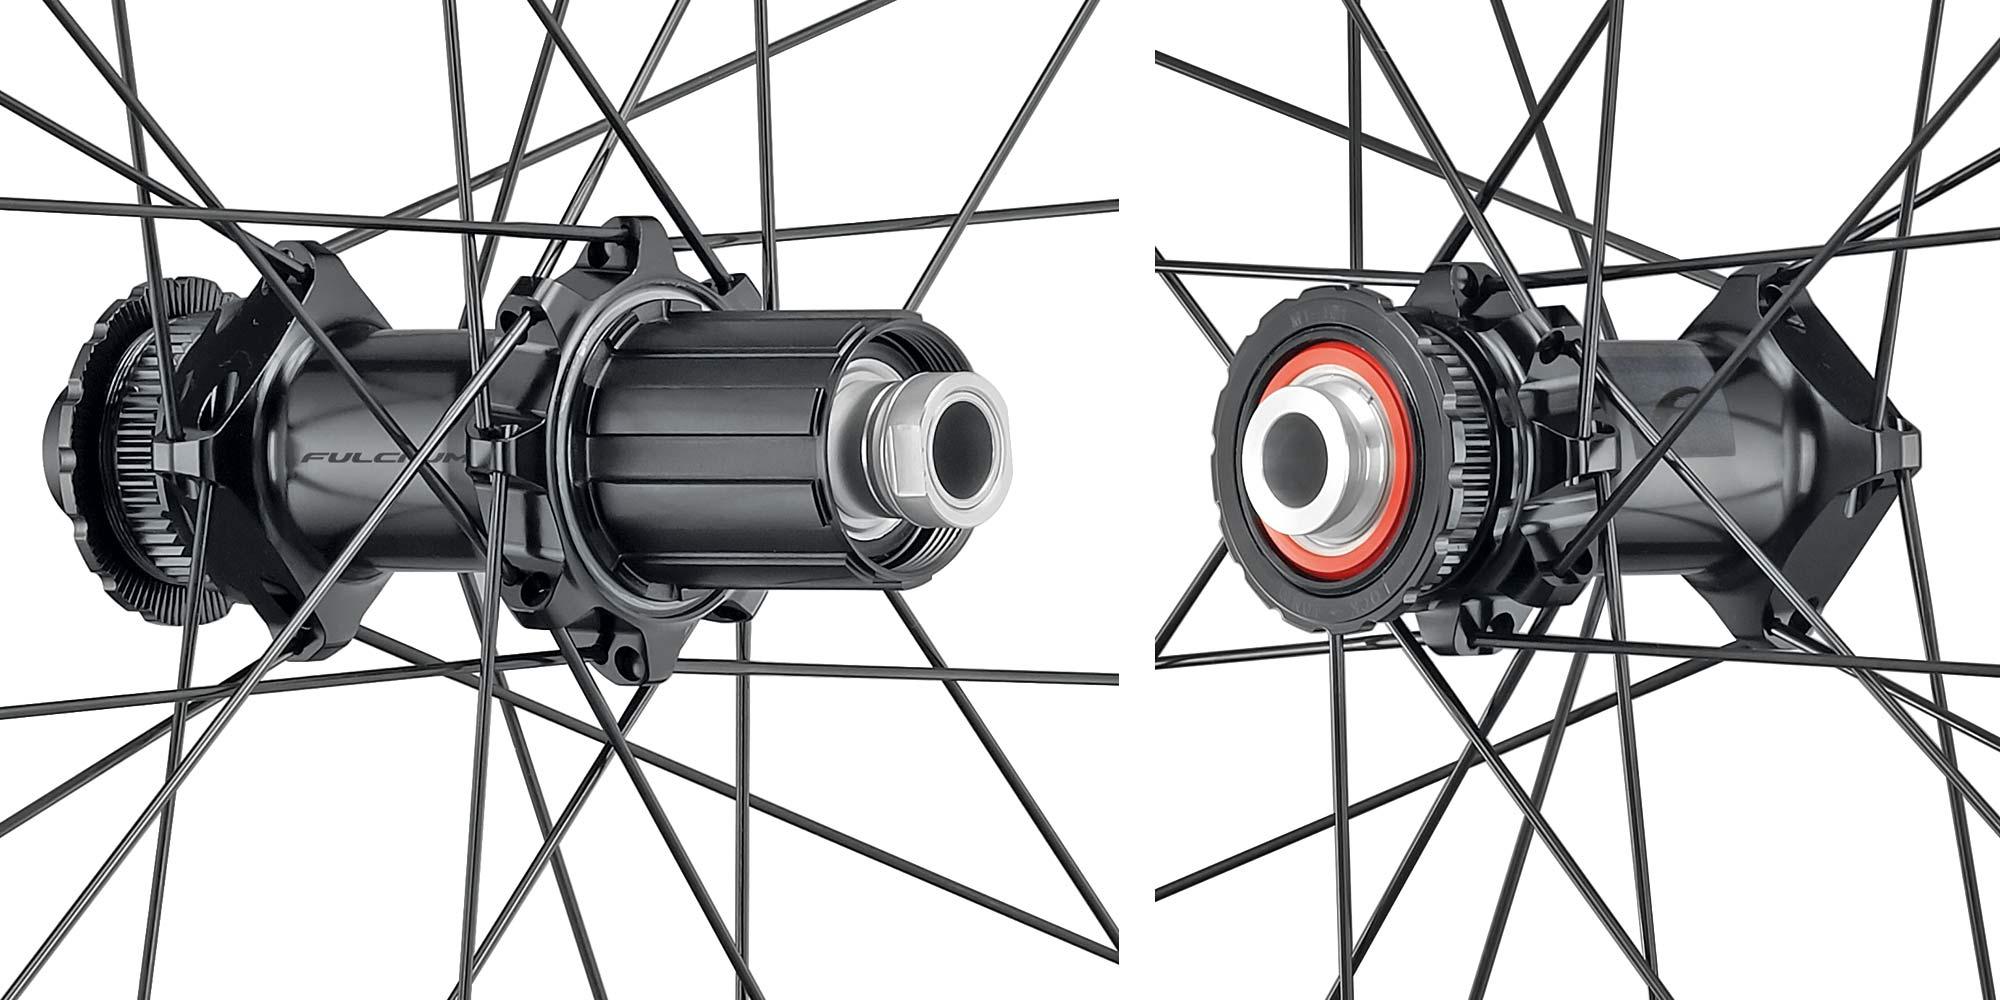 2022 Fulcrum Racing 4, 5, 6 DB alloy road wheels, affordable aluminum tubeless gravel all road bike disc brake hubs